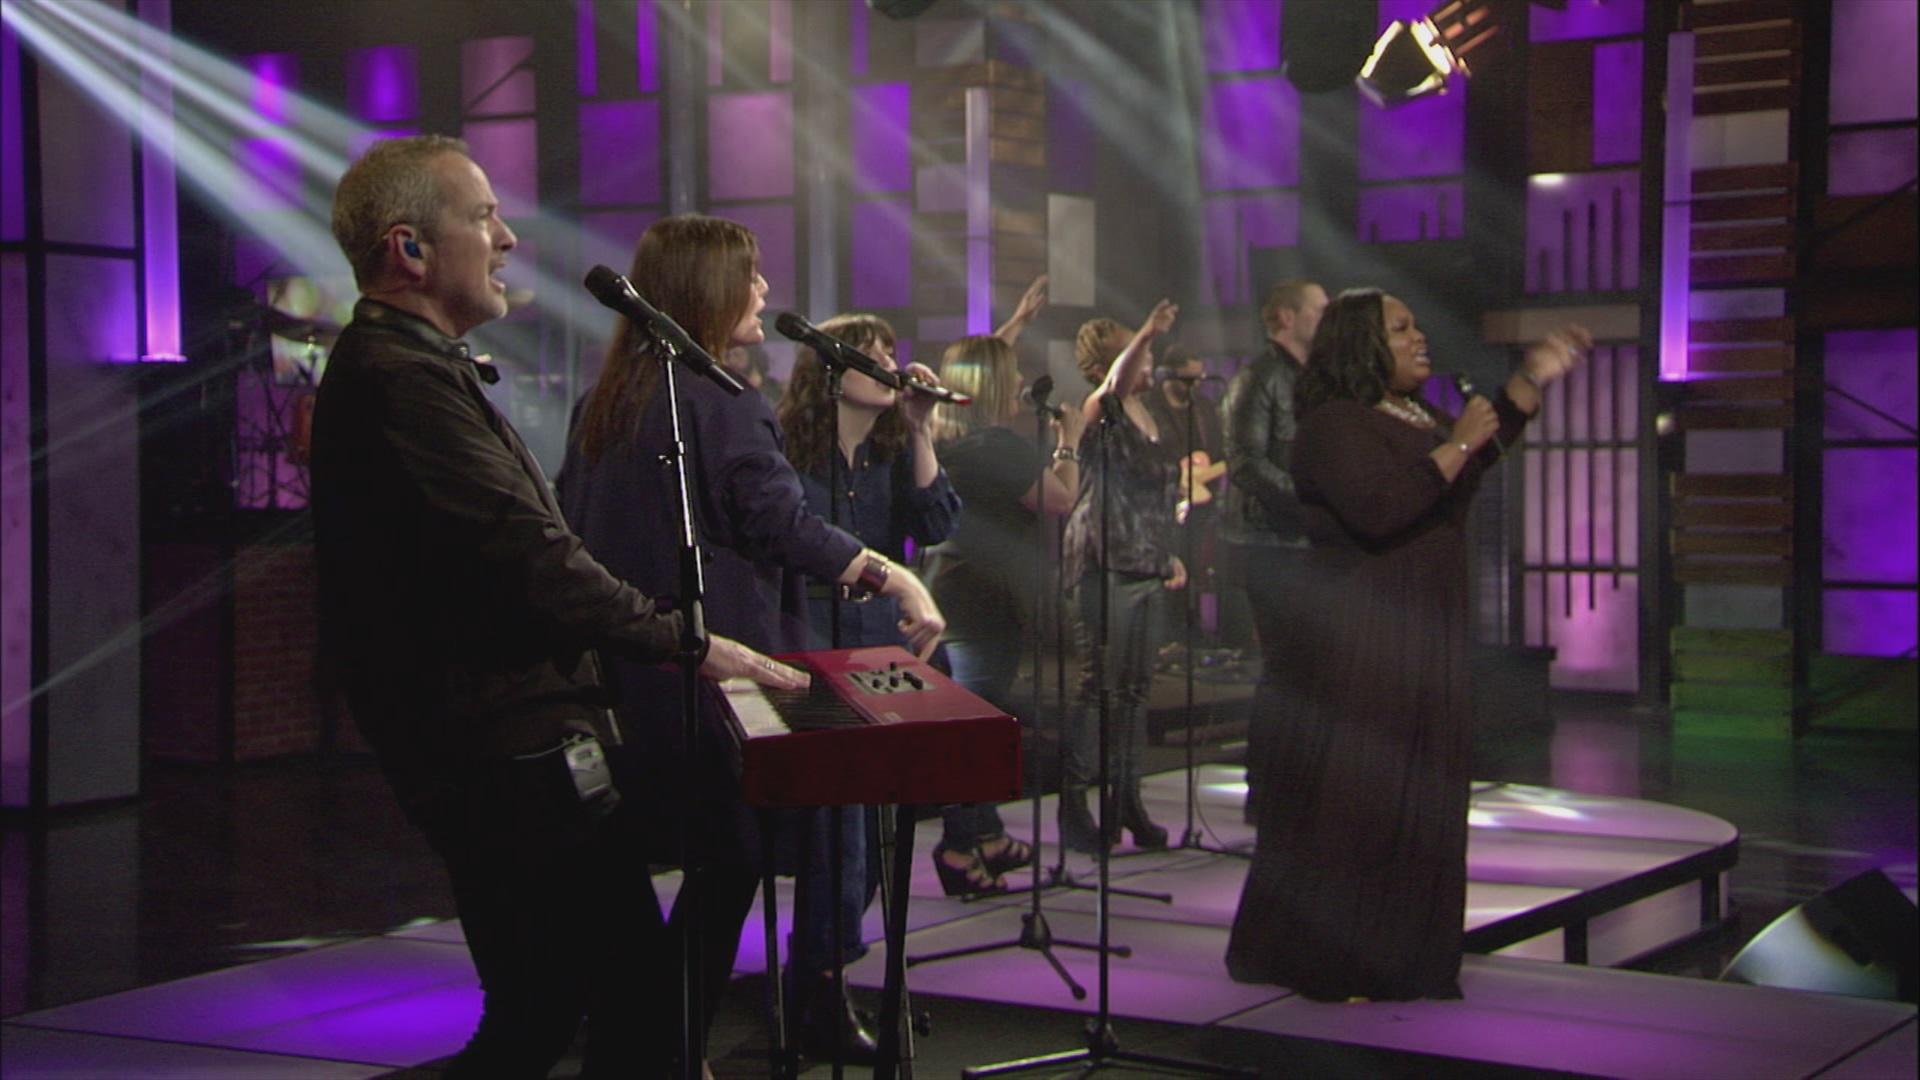 Dwell Album Recording Featuring Tasha Cobbs Leonard